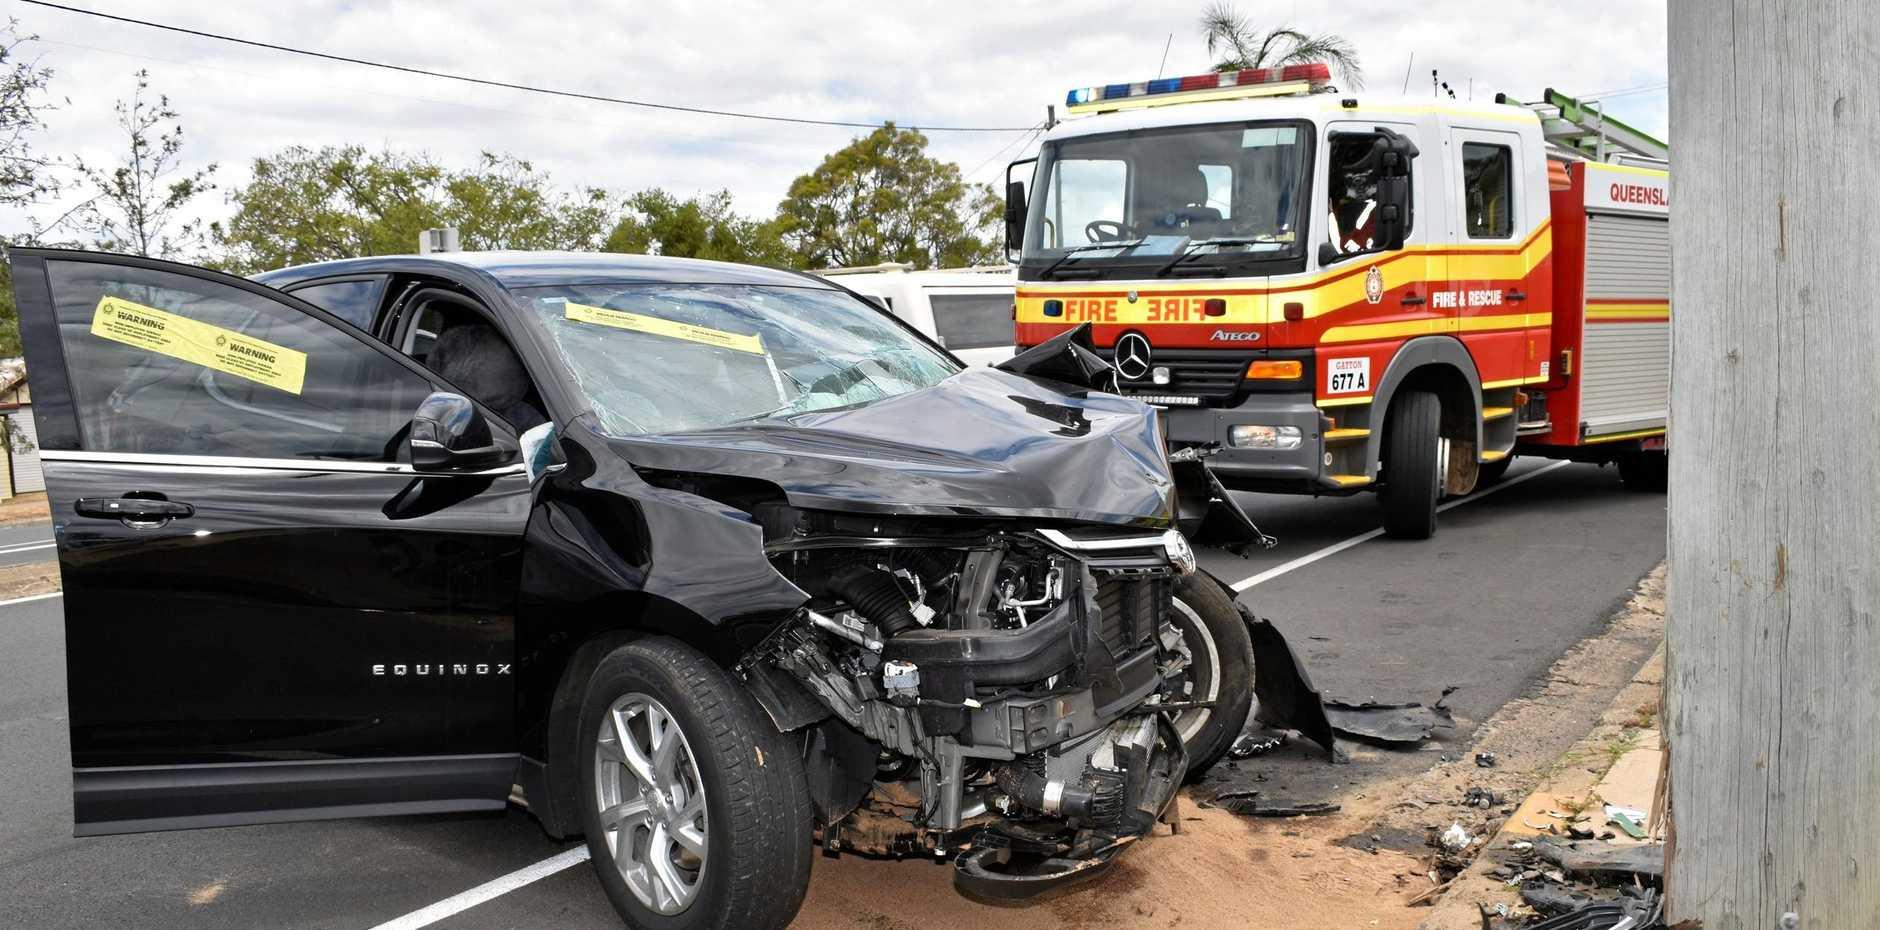 ACCIDENT: Car crashes into a pole at Gatton.